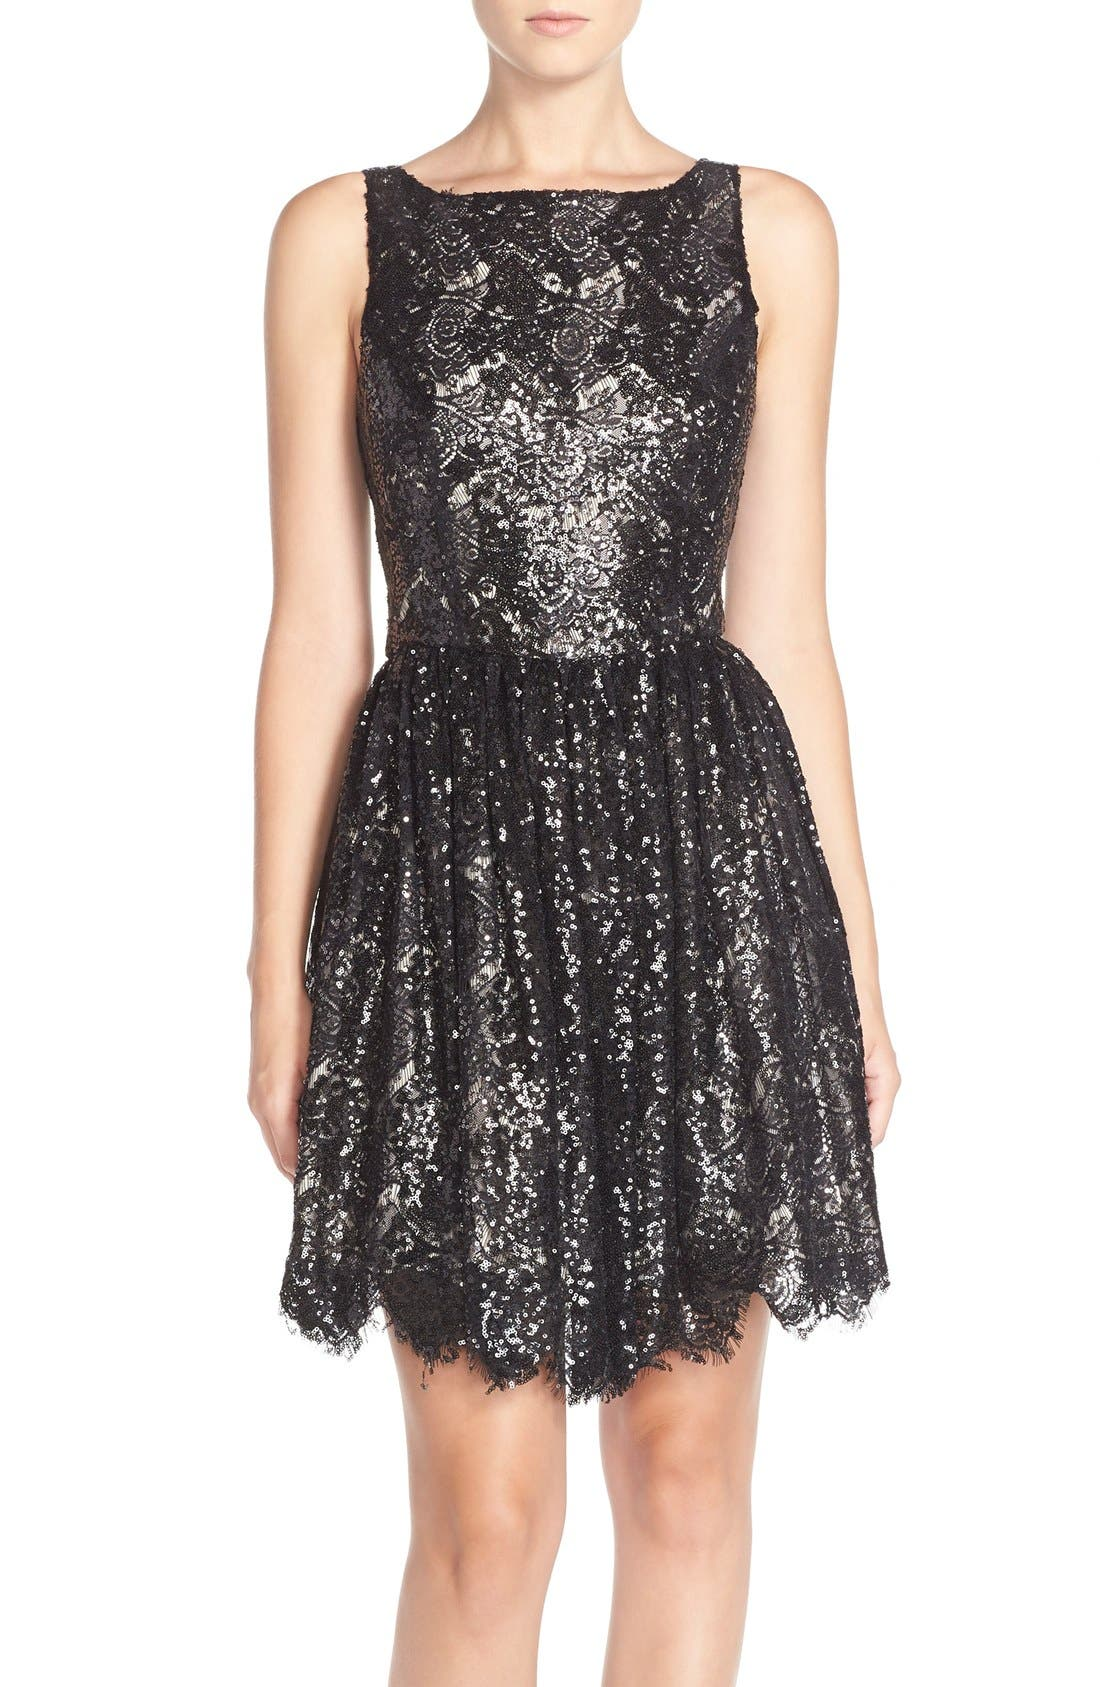 Alternate Image 1 Selected - BB Dakota 'Sabrina' Sequin Fit & Flare Dress